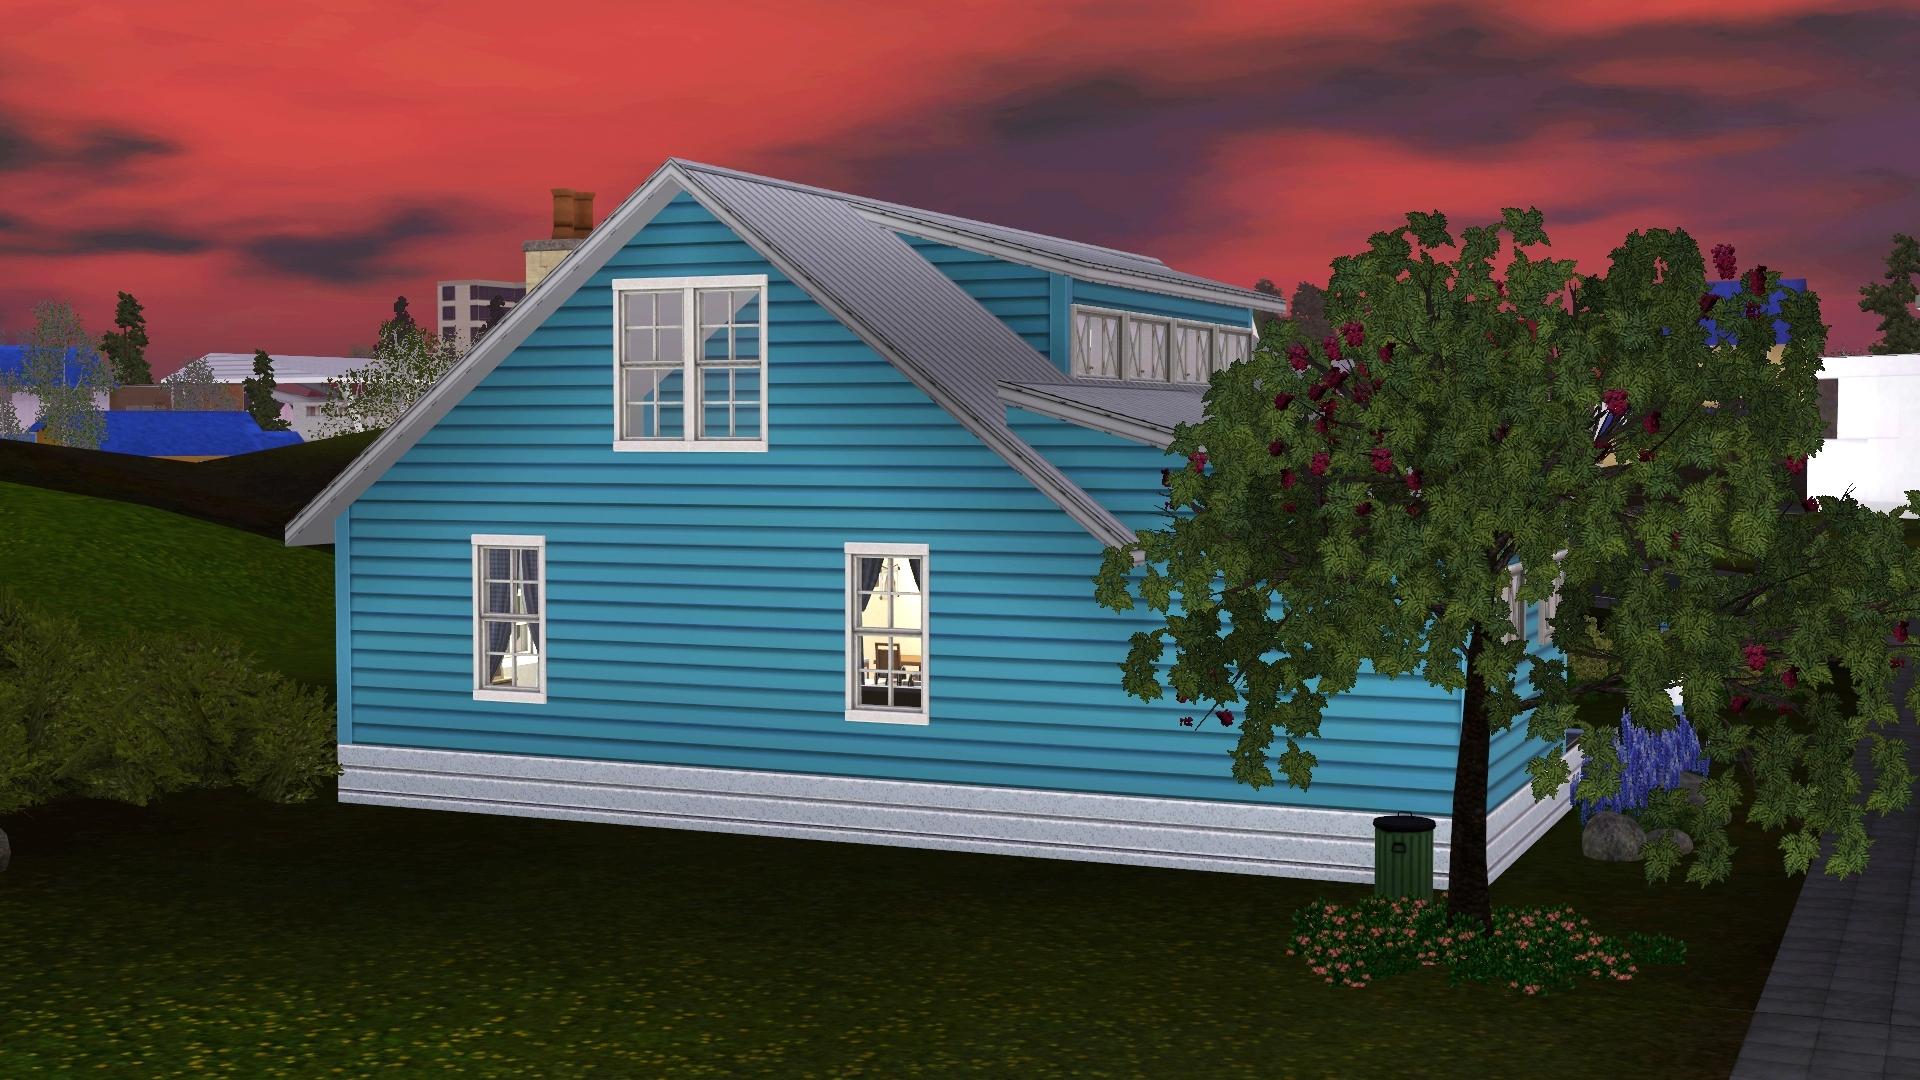 Cottage Lupins by ihelen